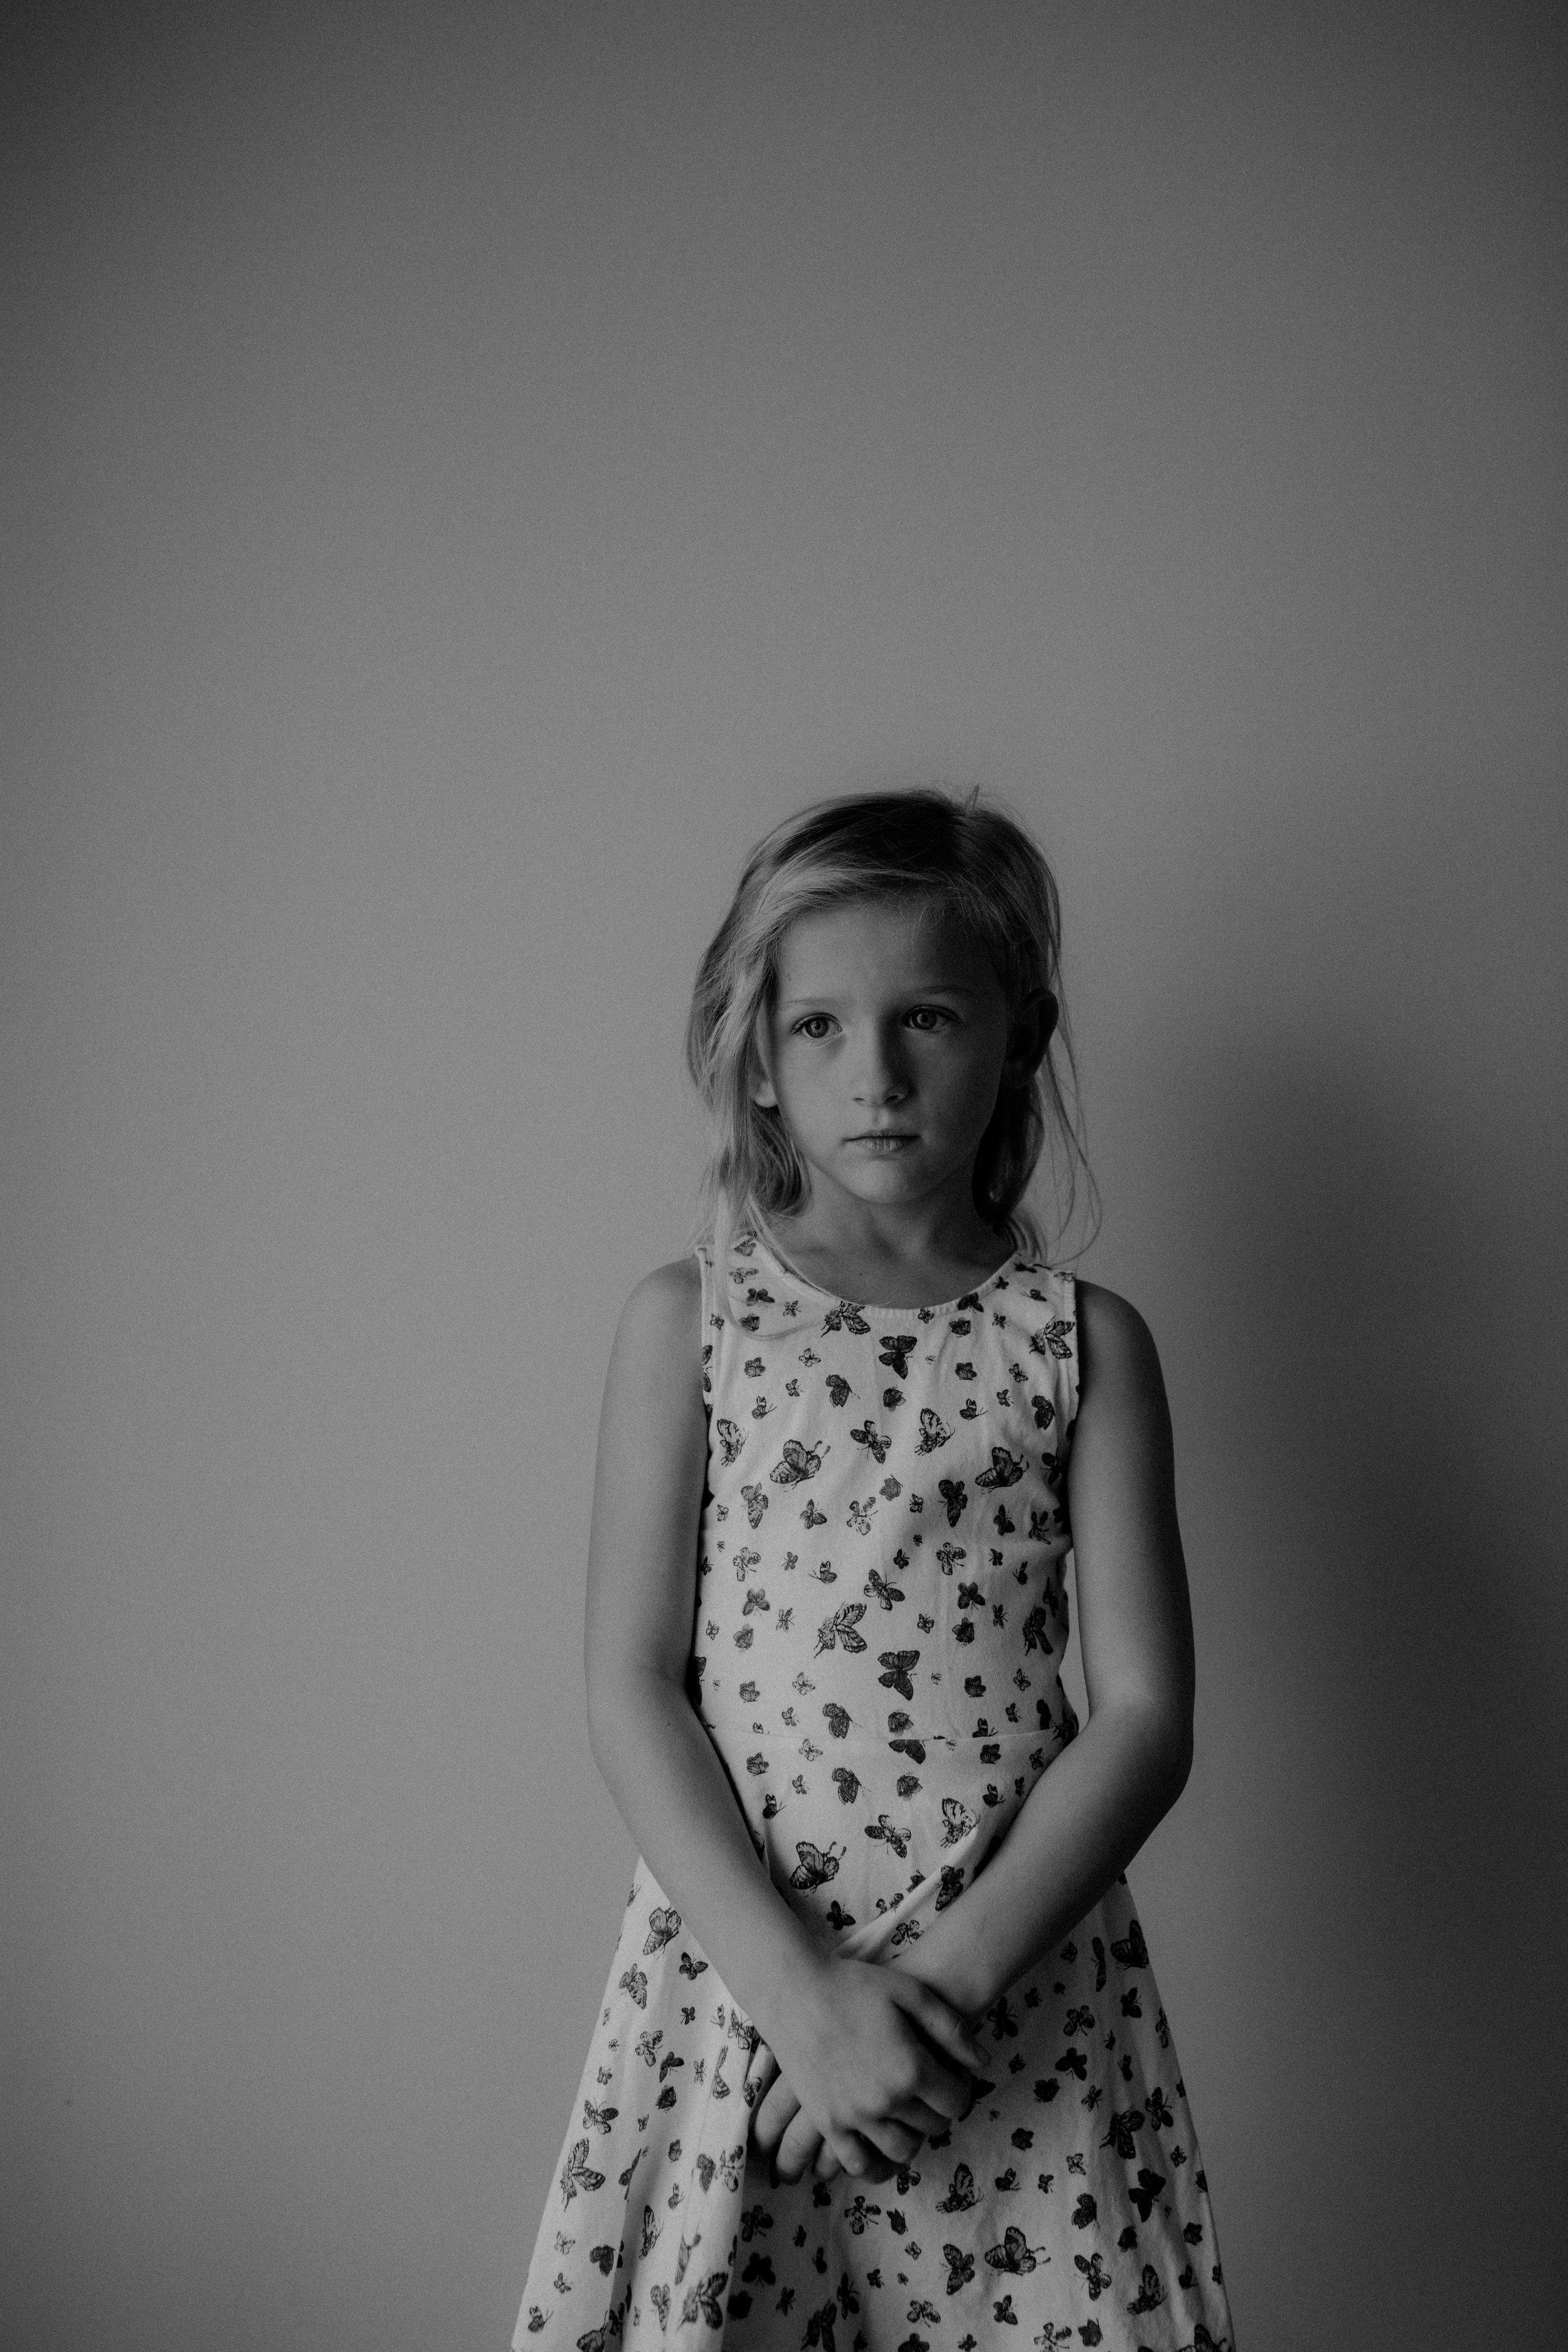 motherhood-self-portrait-32.jpg